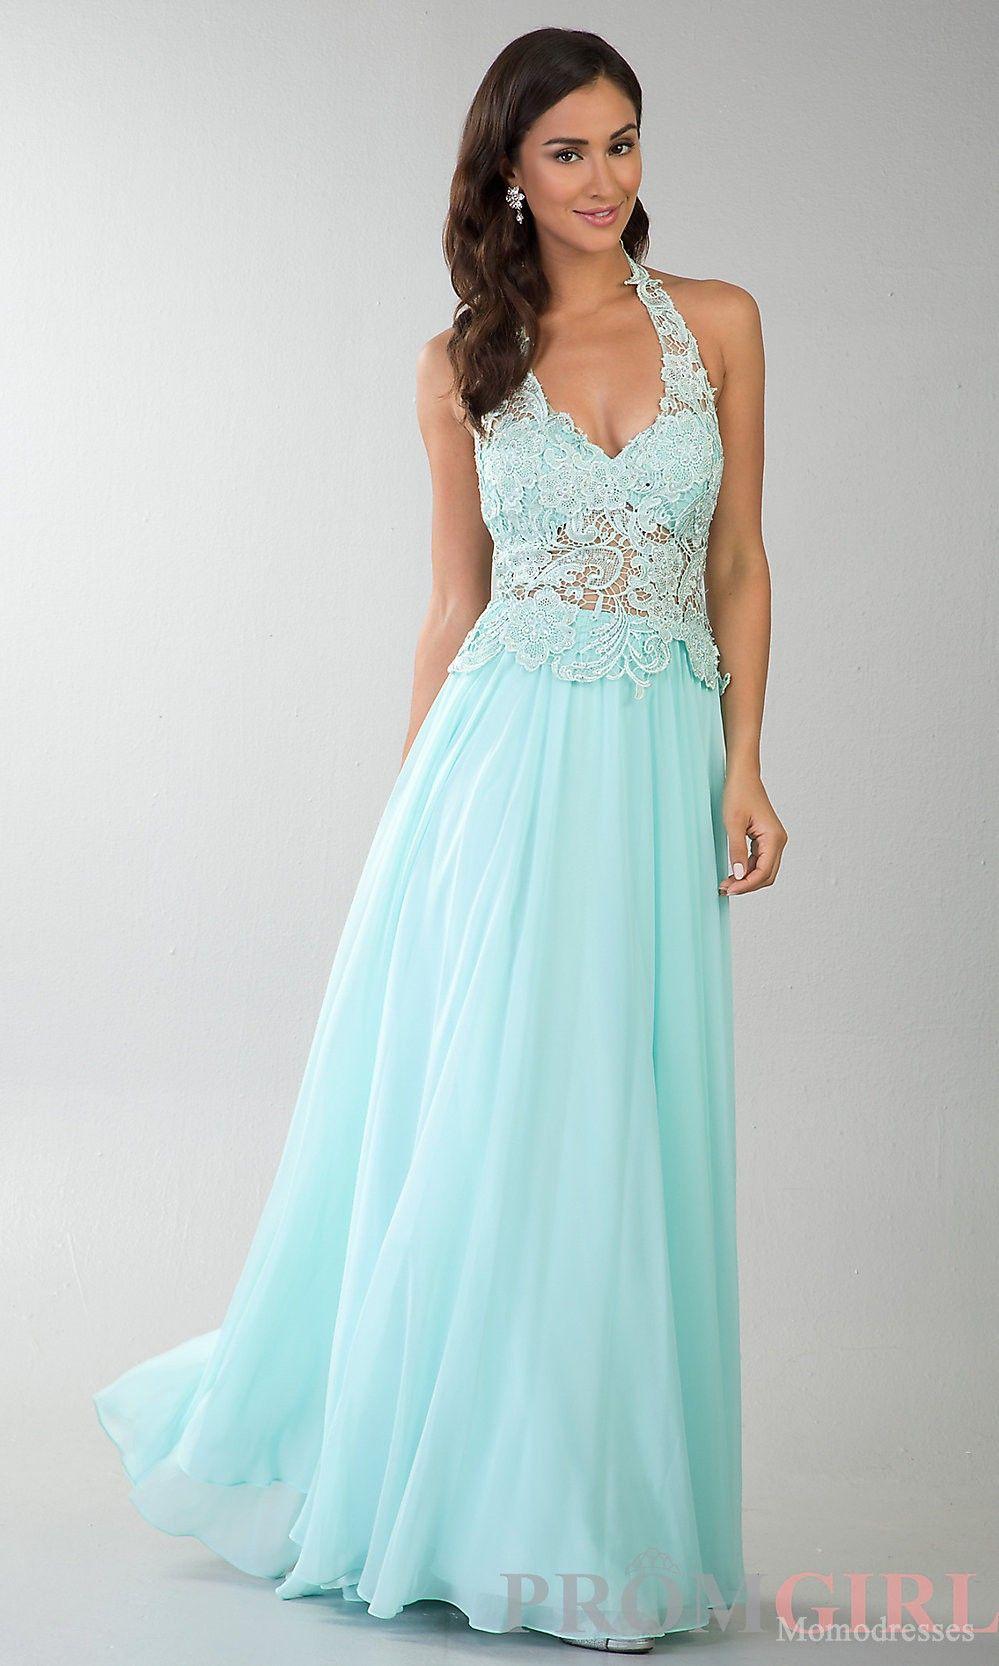 popular dress#prom dressescocktail New Hot New Fashion wedding ...